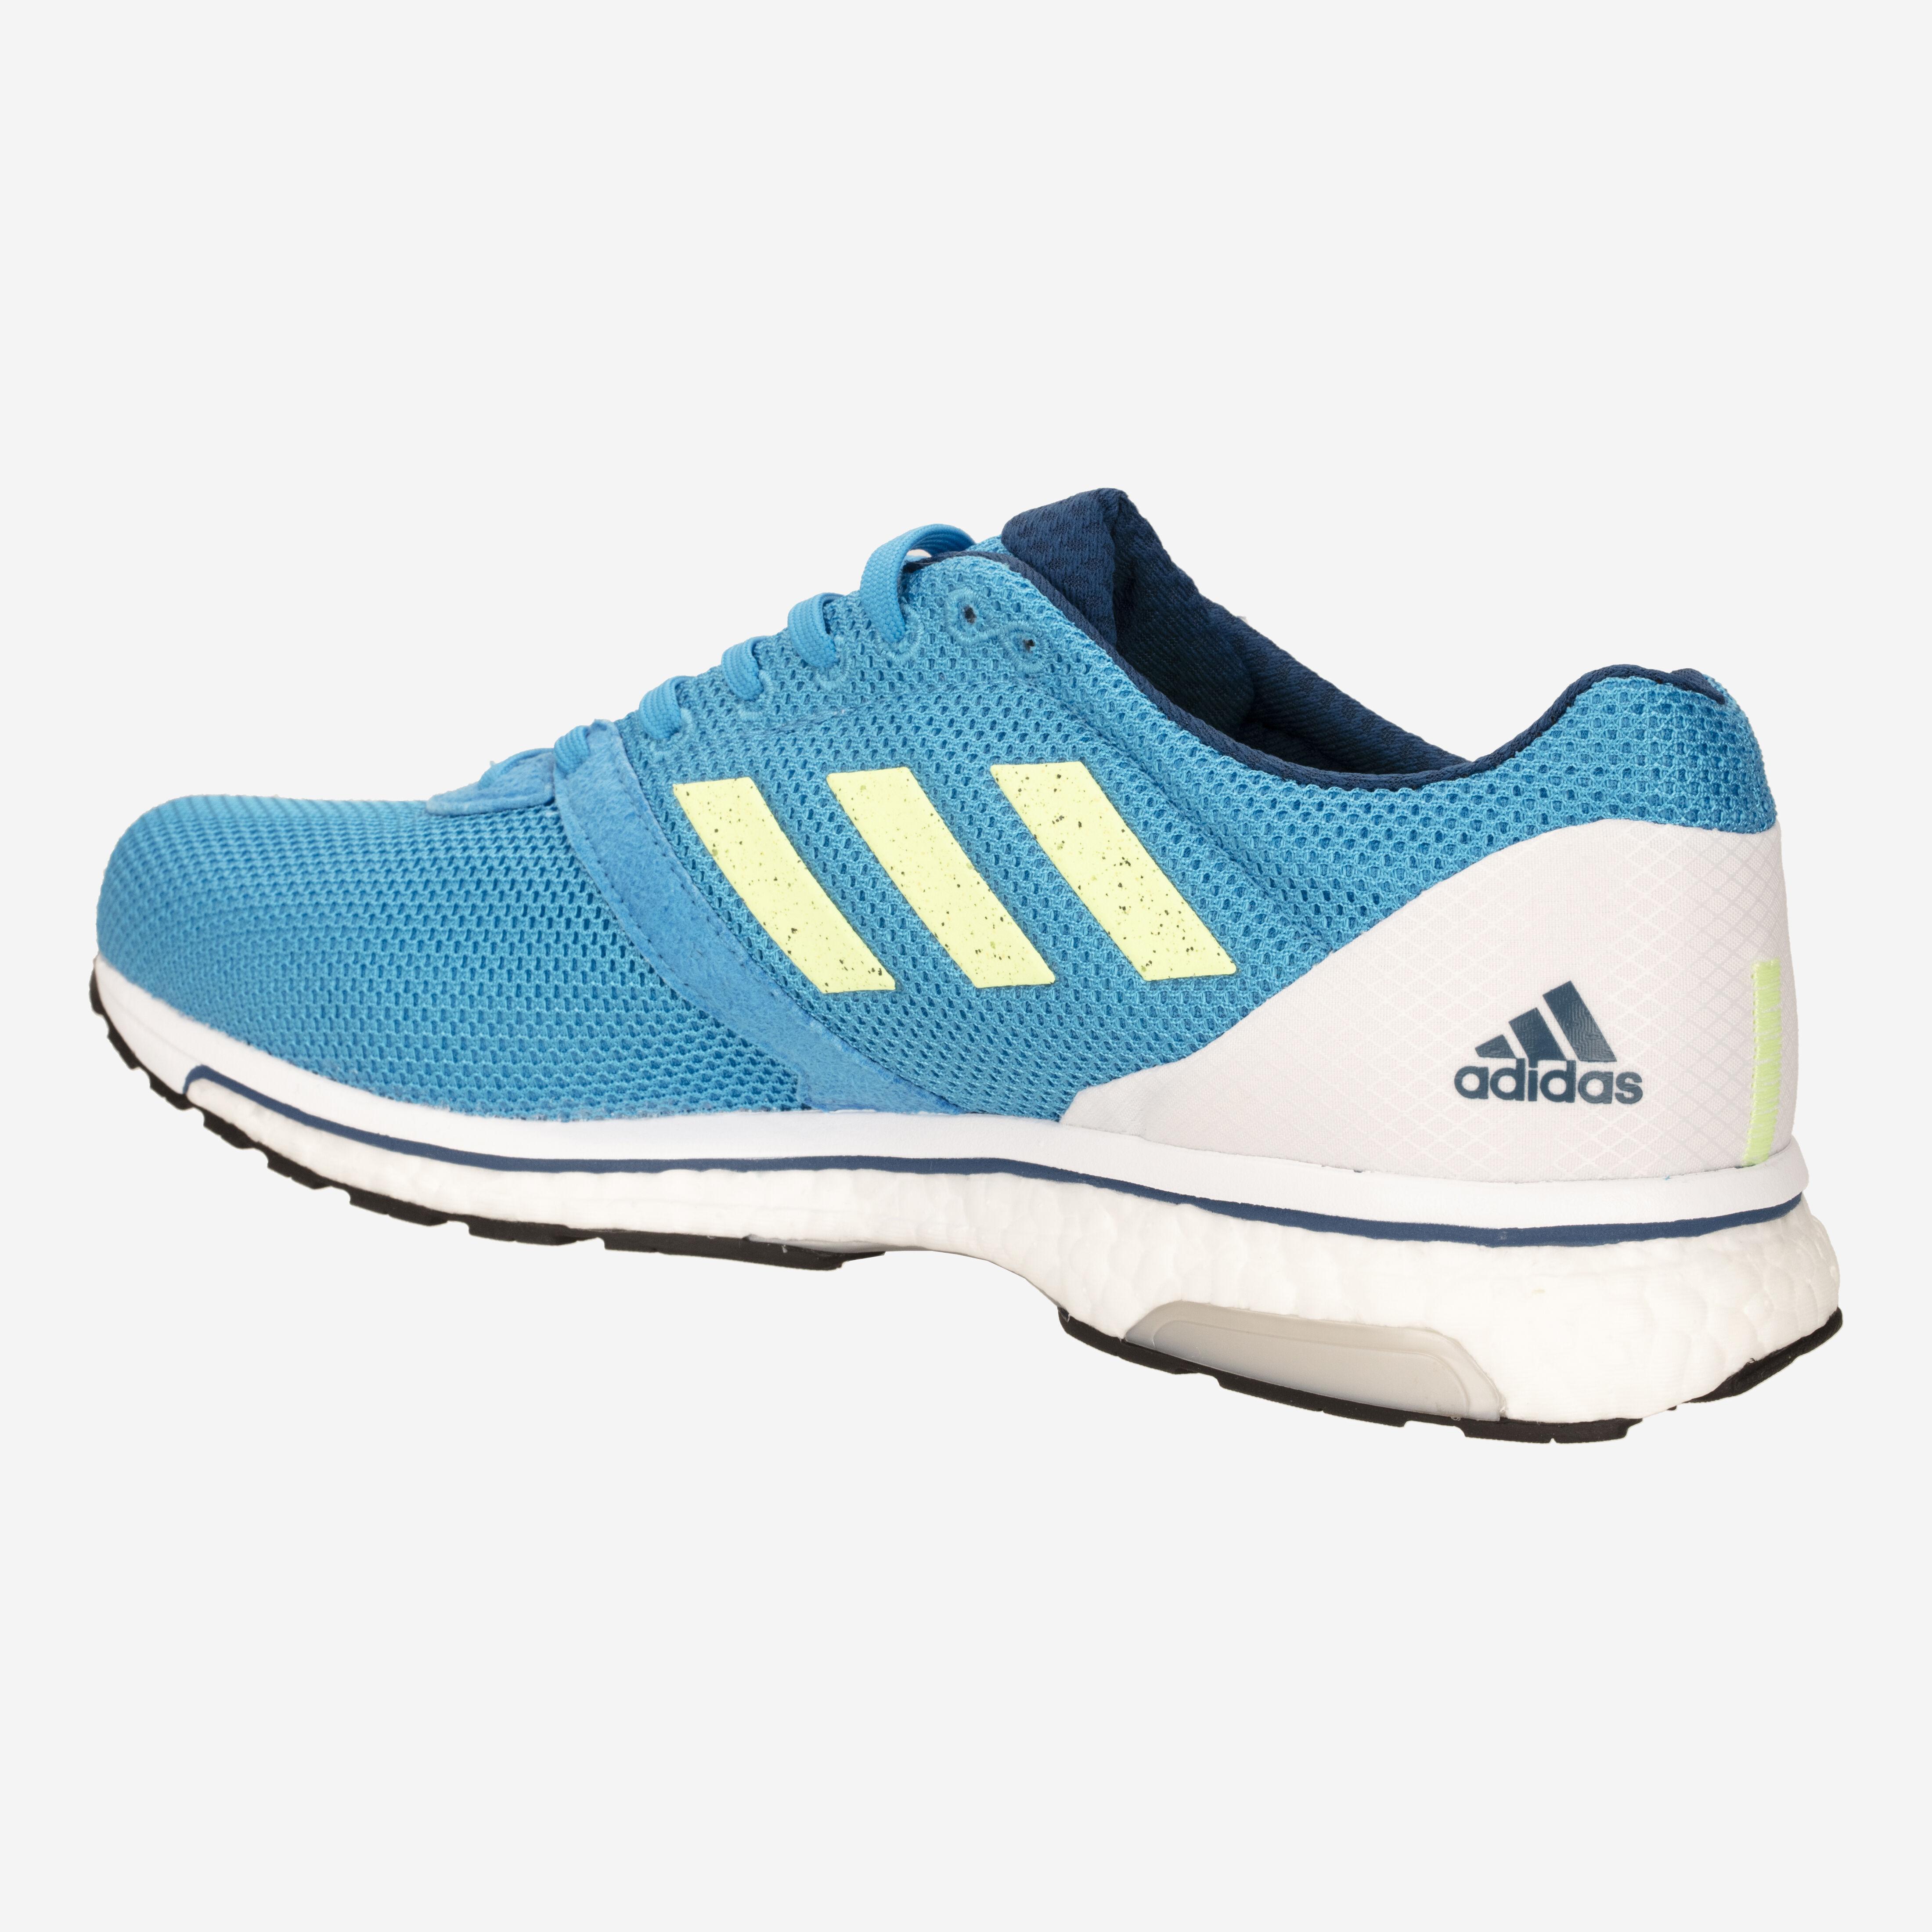 code promo 29fc3 b3e02 Adidas Adizero Adios 4